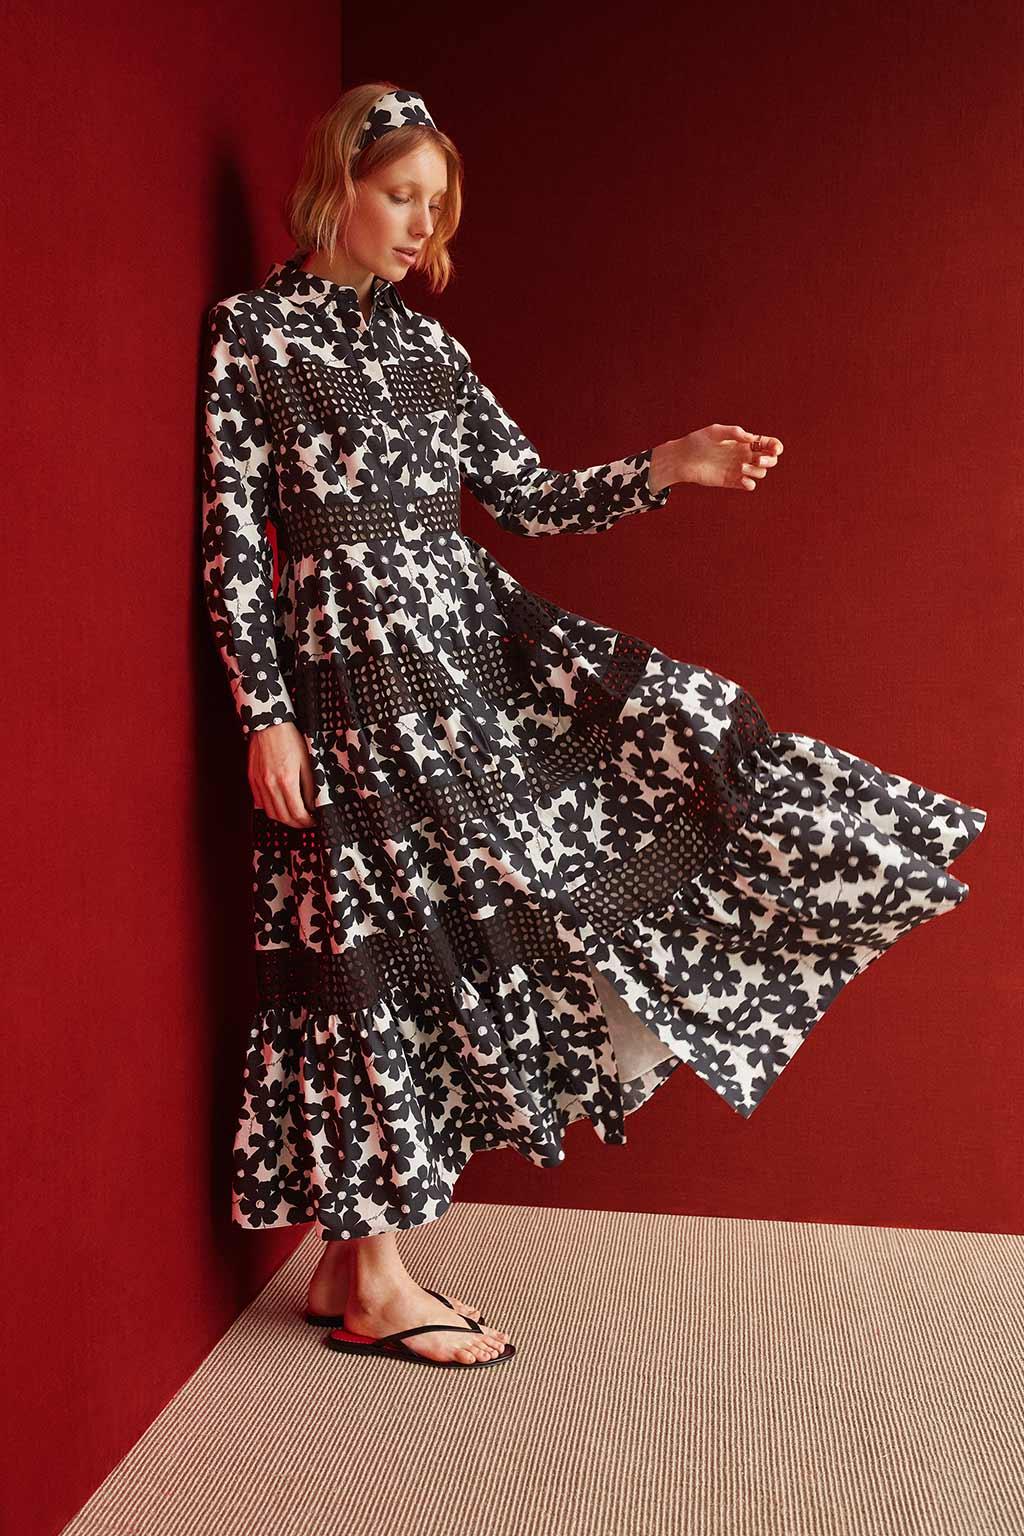 CH Carolina Herrera. New Womenswear Collection Summer. Look 07